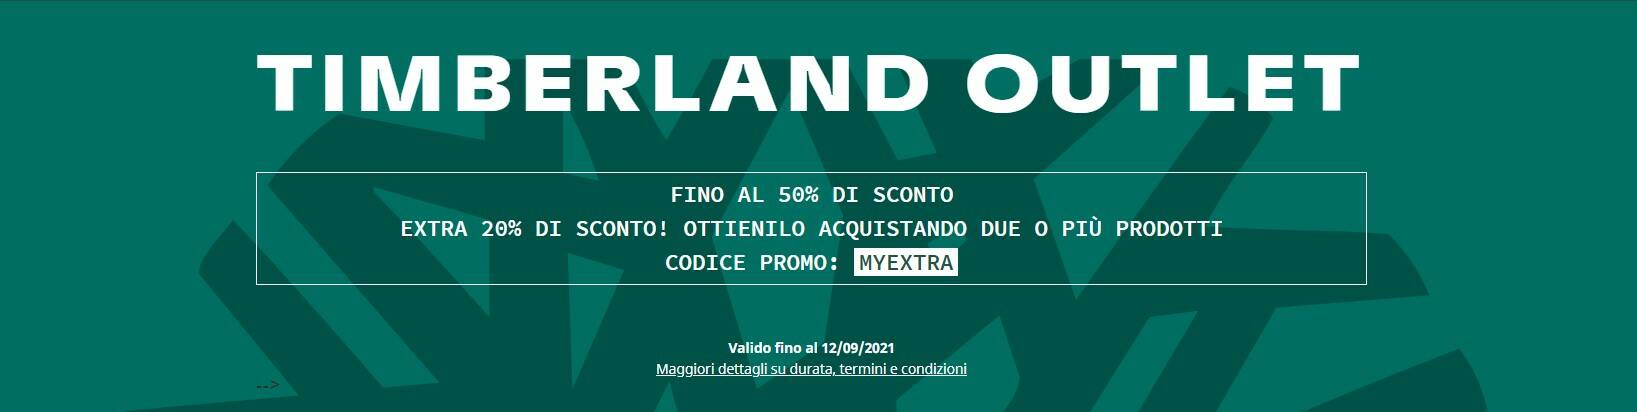 offerte_timberland